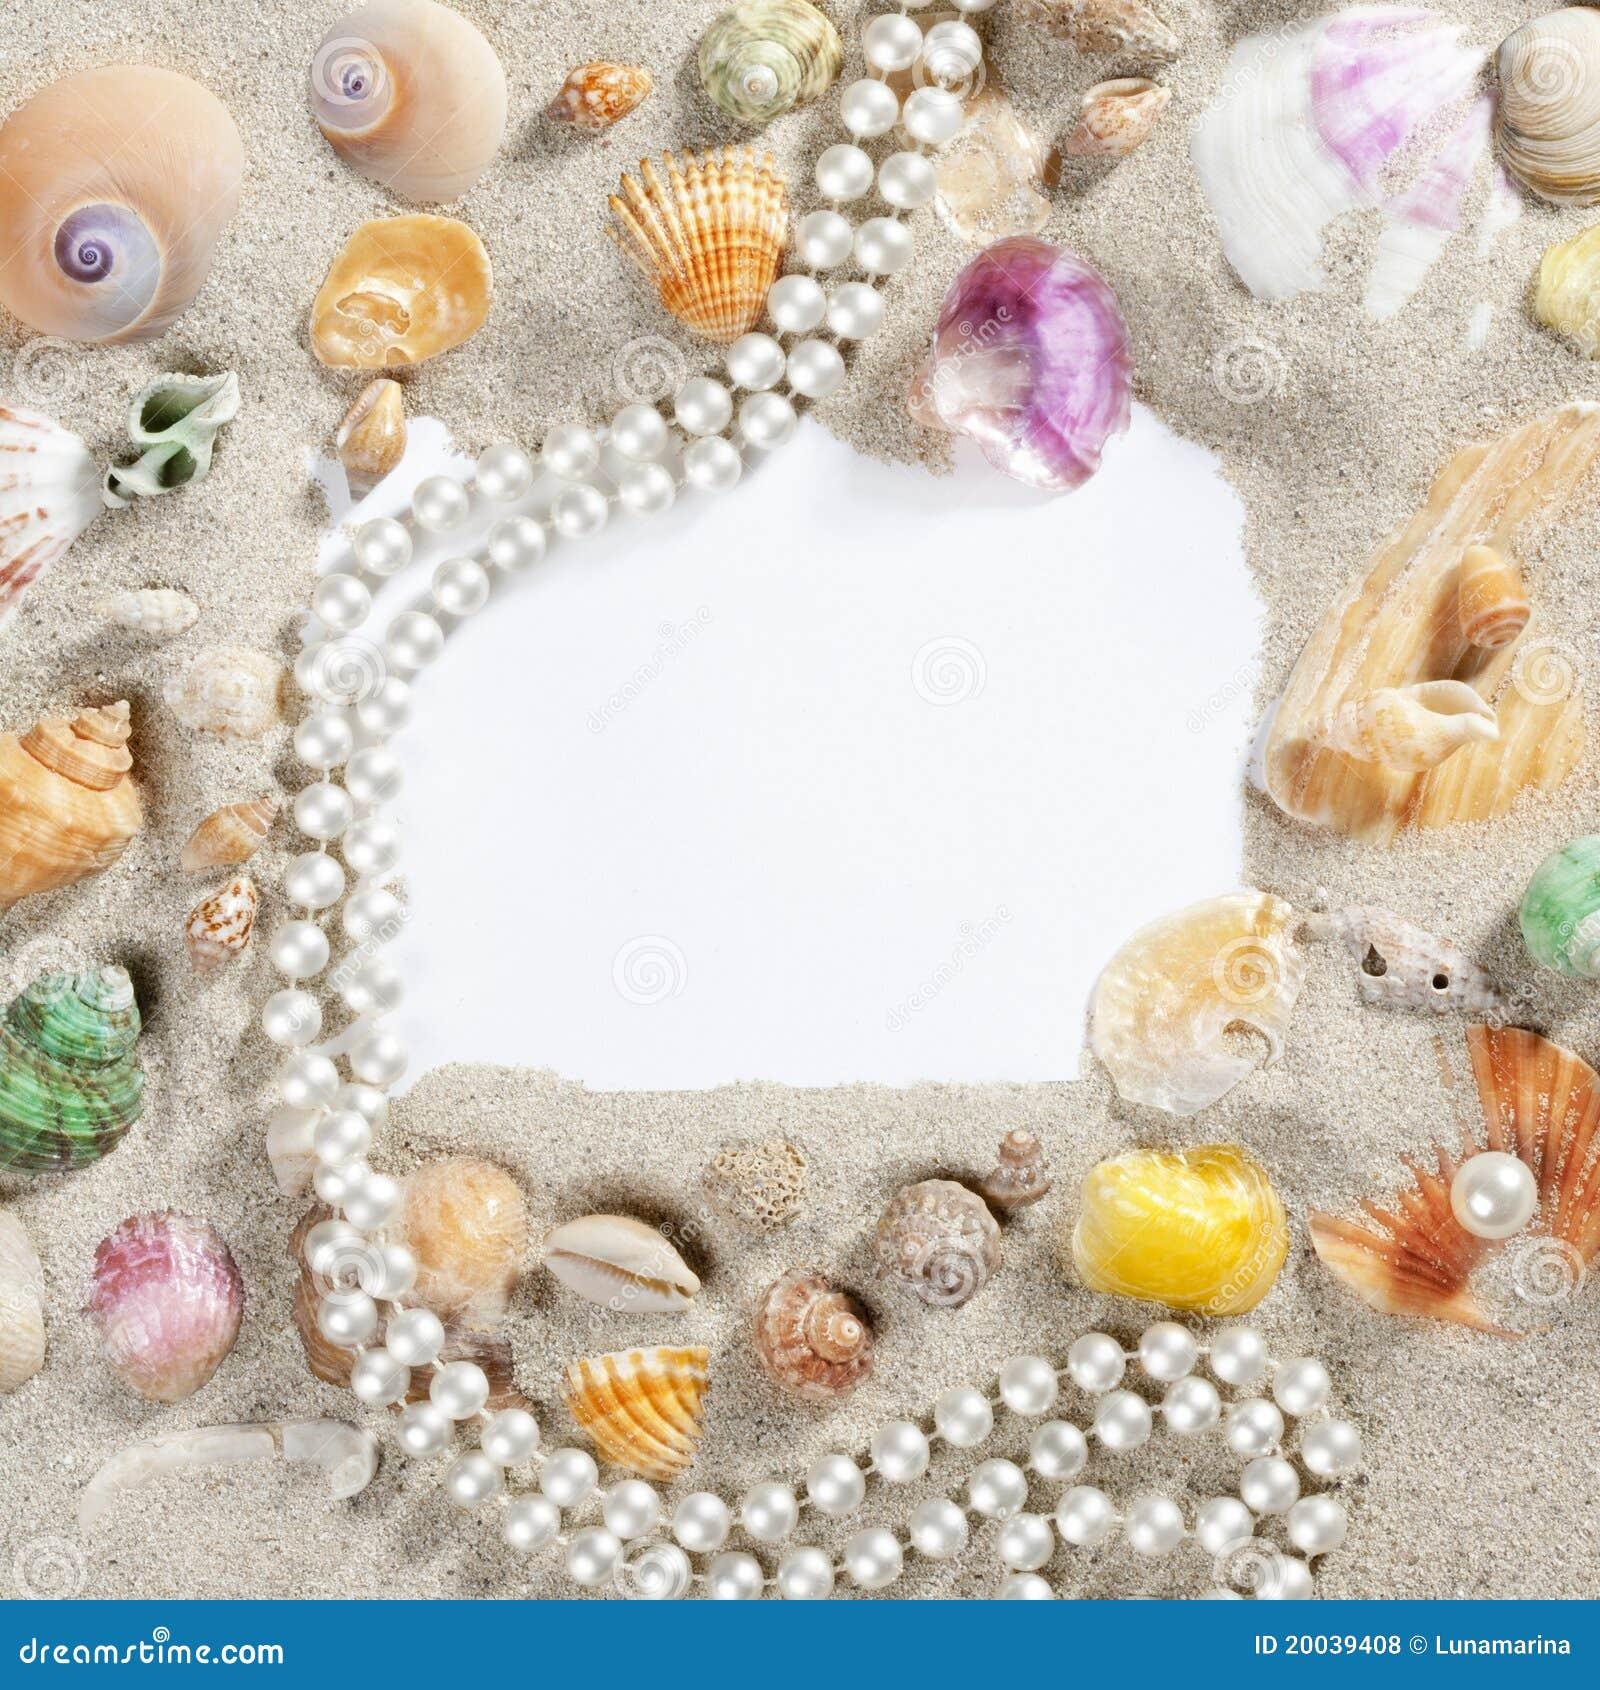 border frame summer beach shell pearl necklace royalty. Black Bedroom Furniture Sets. Home Design Ideas